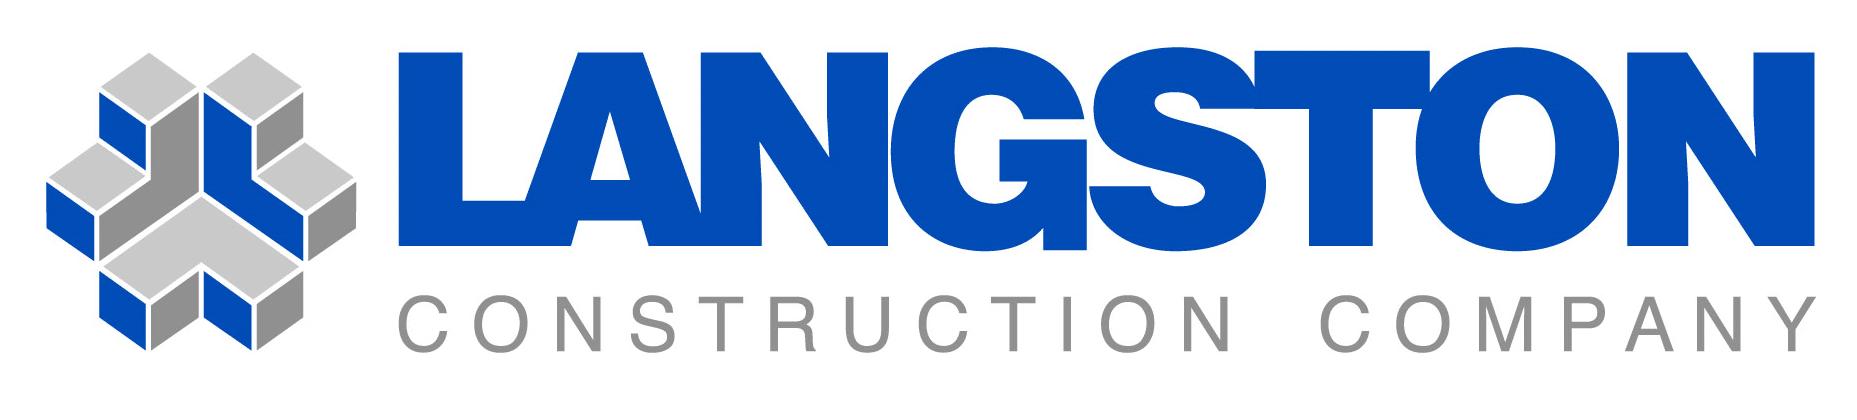 langston construction company logo